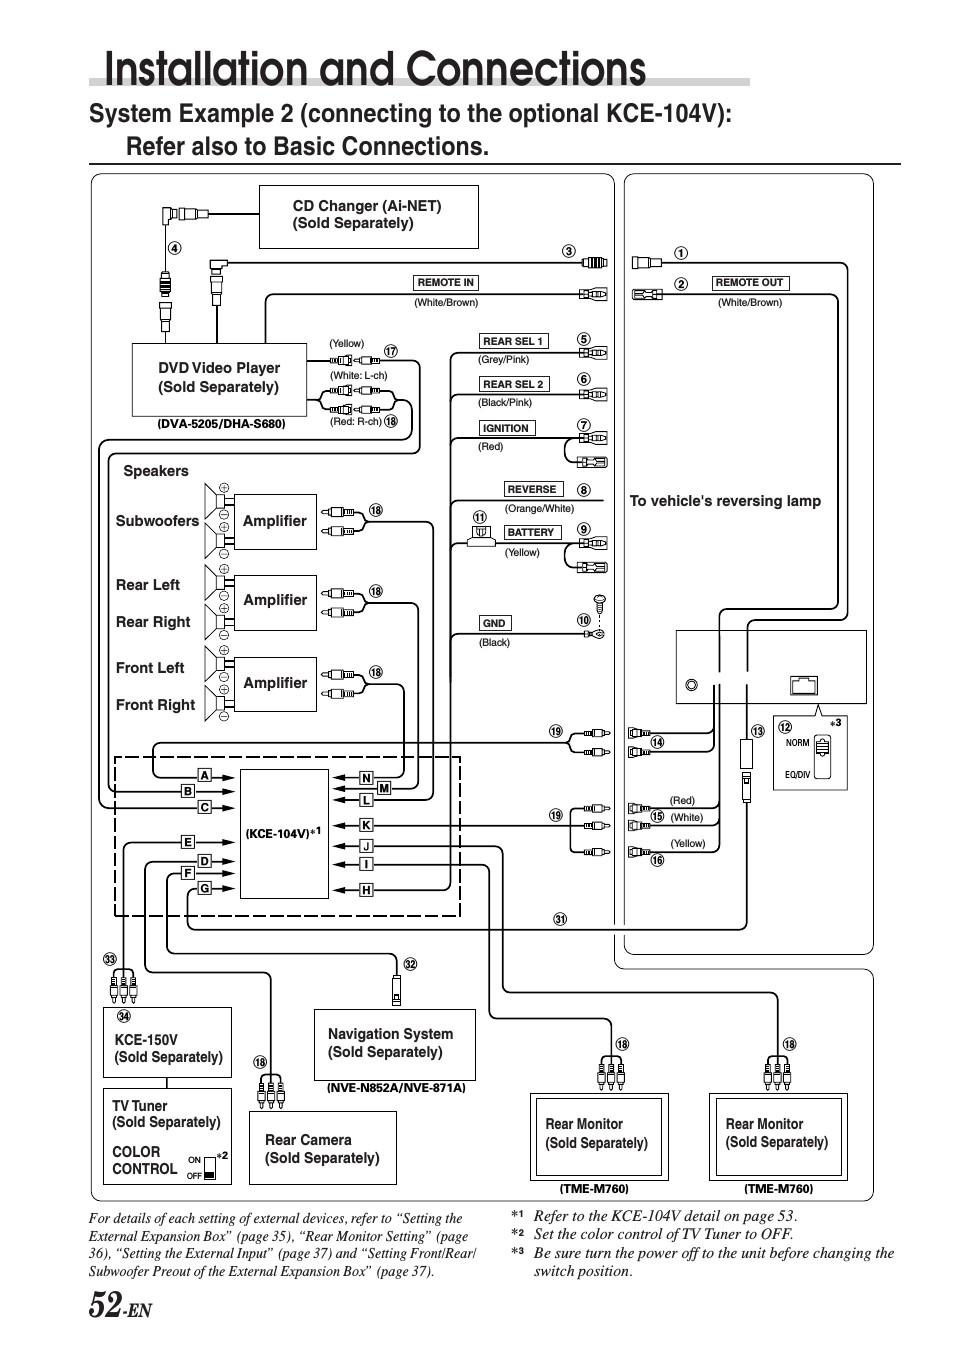 Kib M2401 Installation Manual Installation and Connections Alpine Cva 1004 User Manual Of Kib M2401 Installation Manual